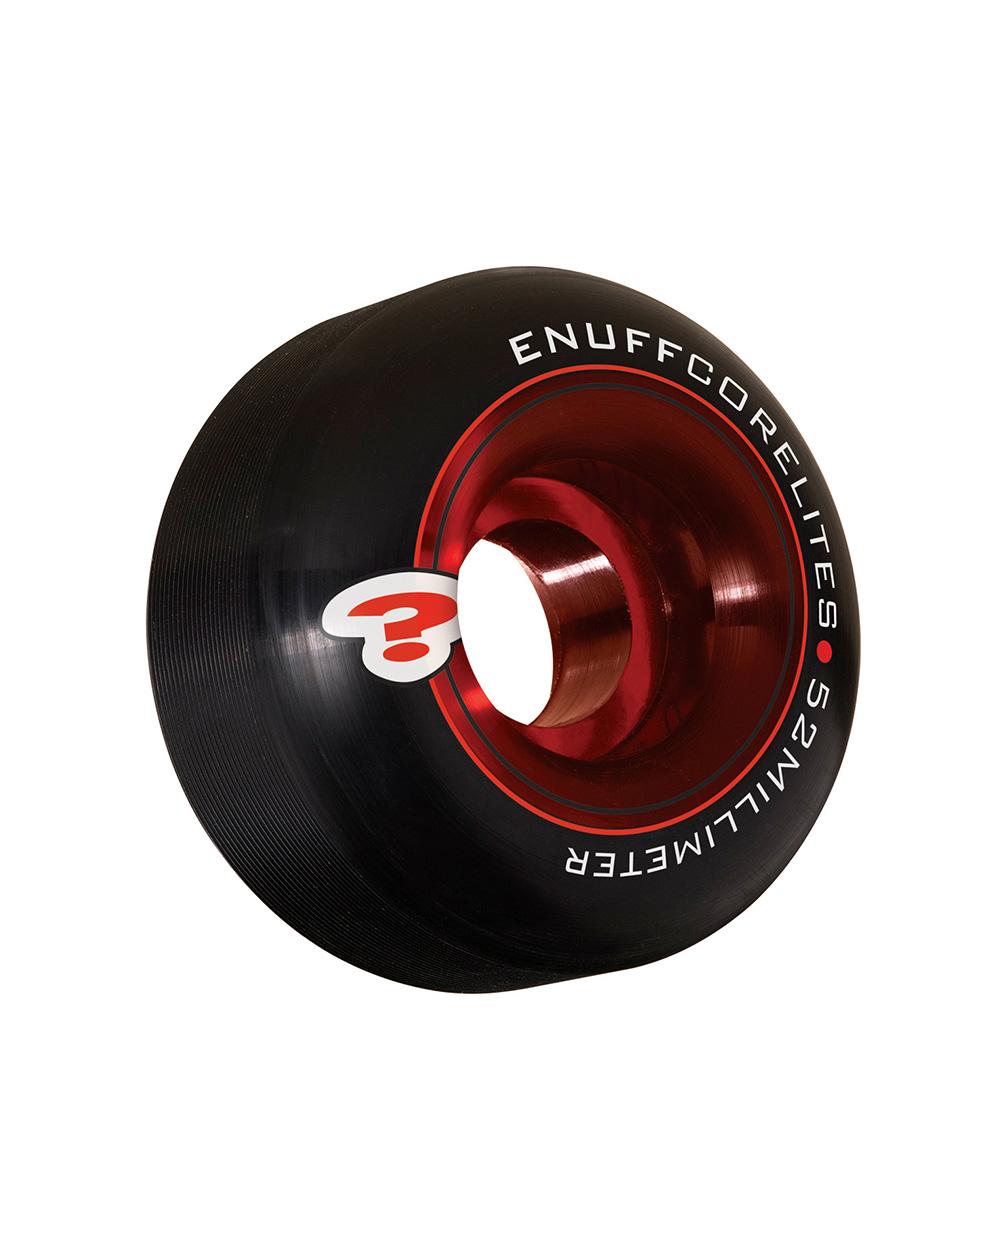 Enuff Ruote Skateboard Corelites 52mm Black/Red 4 pz